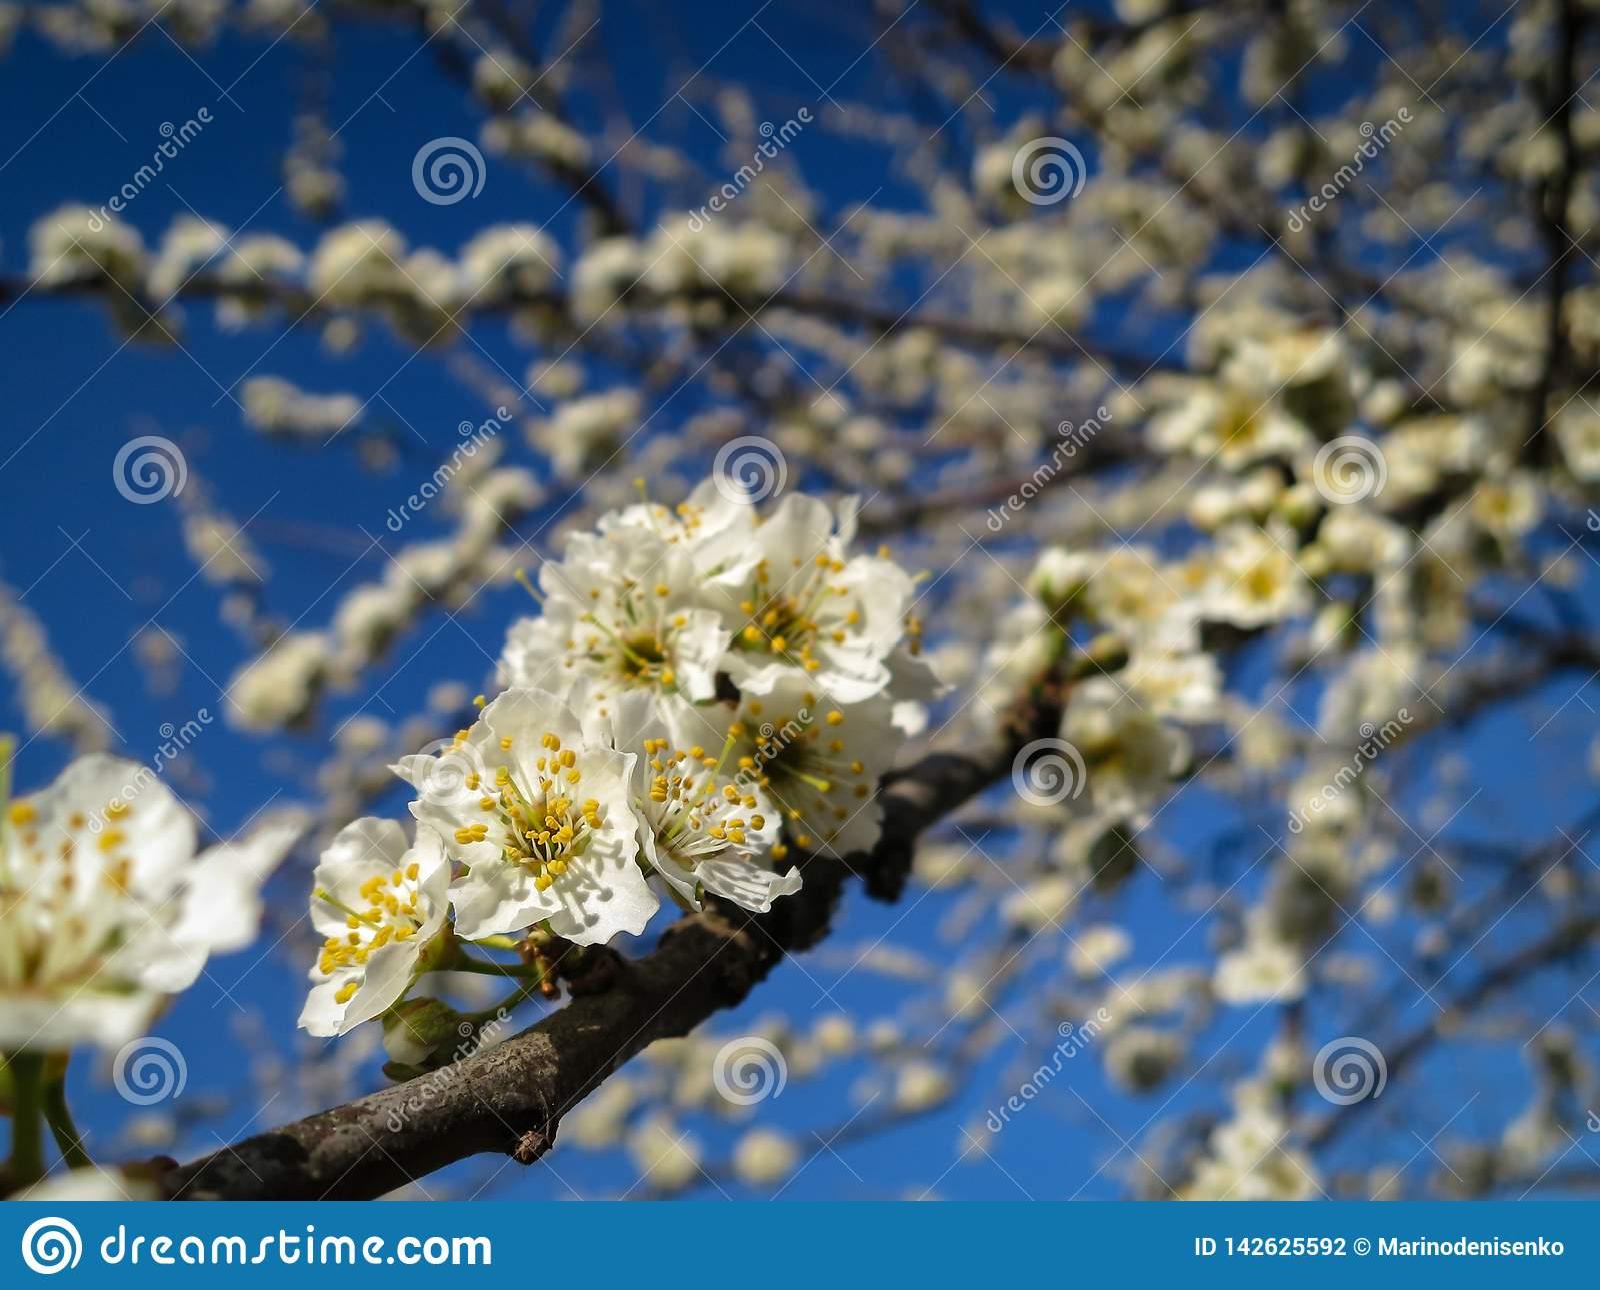 Close-up of white cherry plum flowers blossom in spring. A lot of white flowers in sunny spring day with blue sky